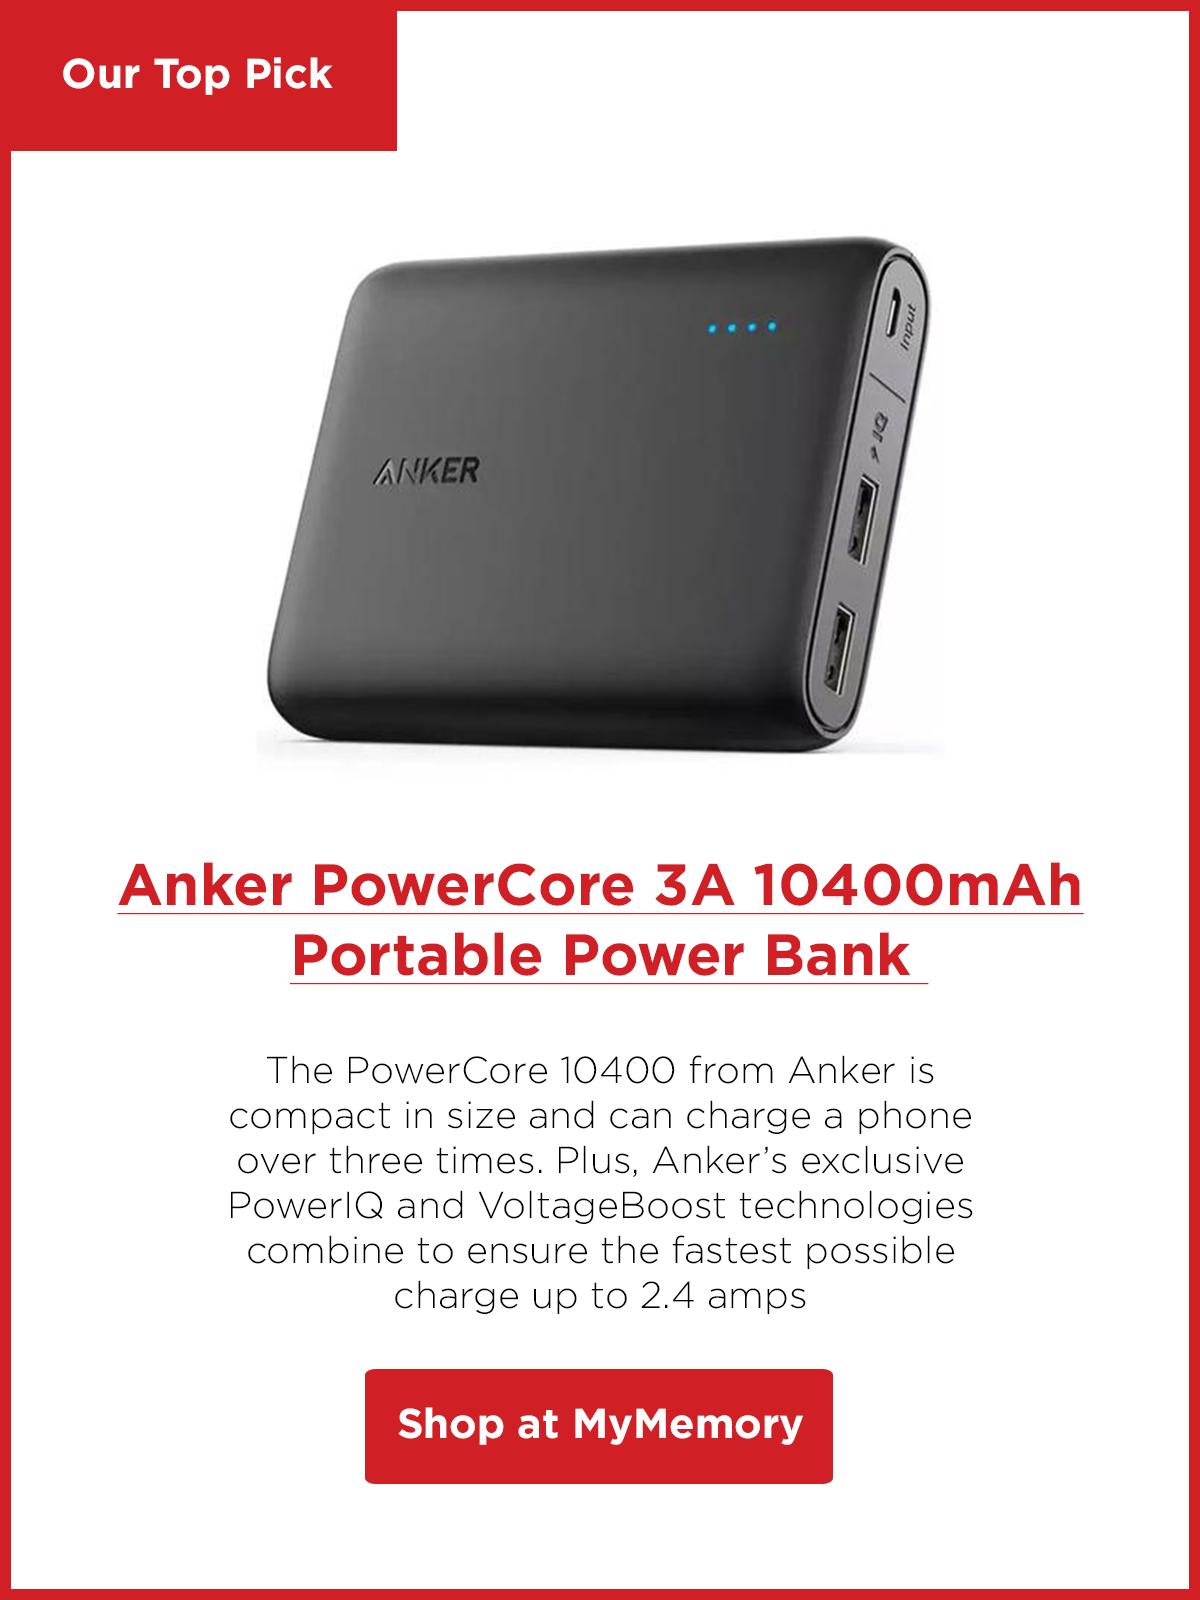 Anker PowerCore 3A 10400mAh Portable Power Bank with PowerIQ - Black